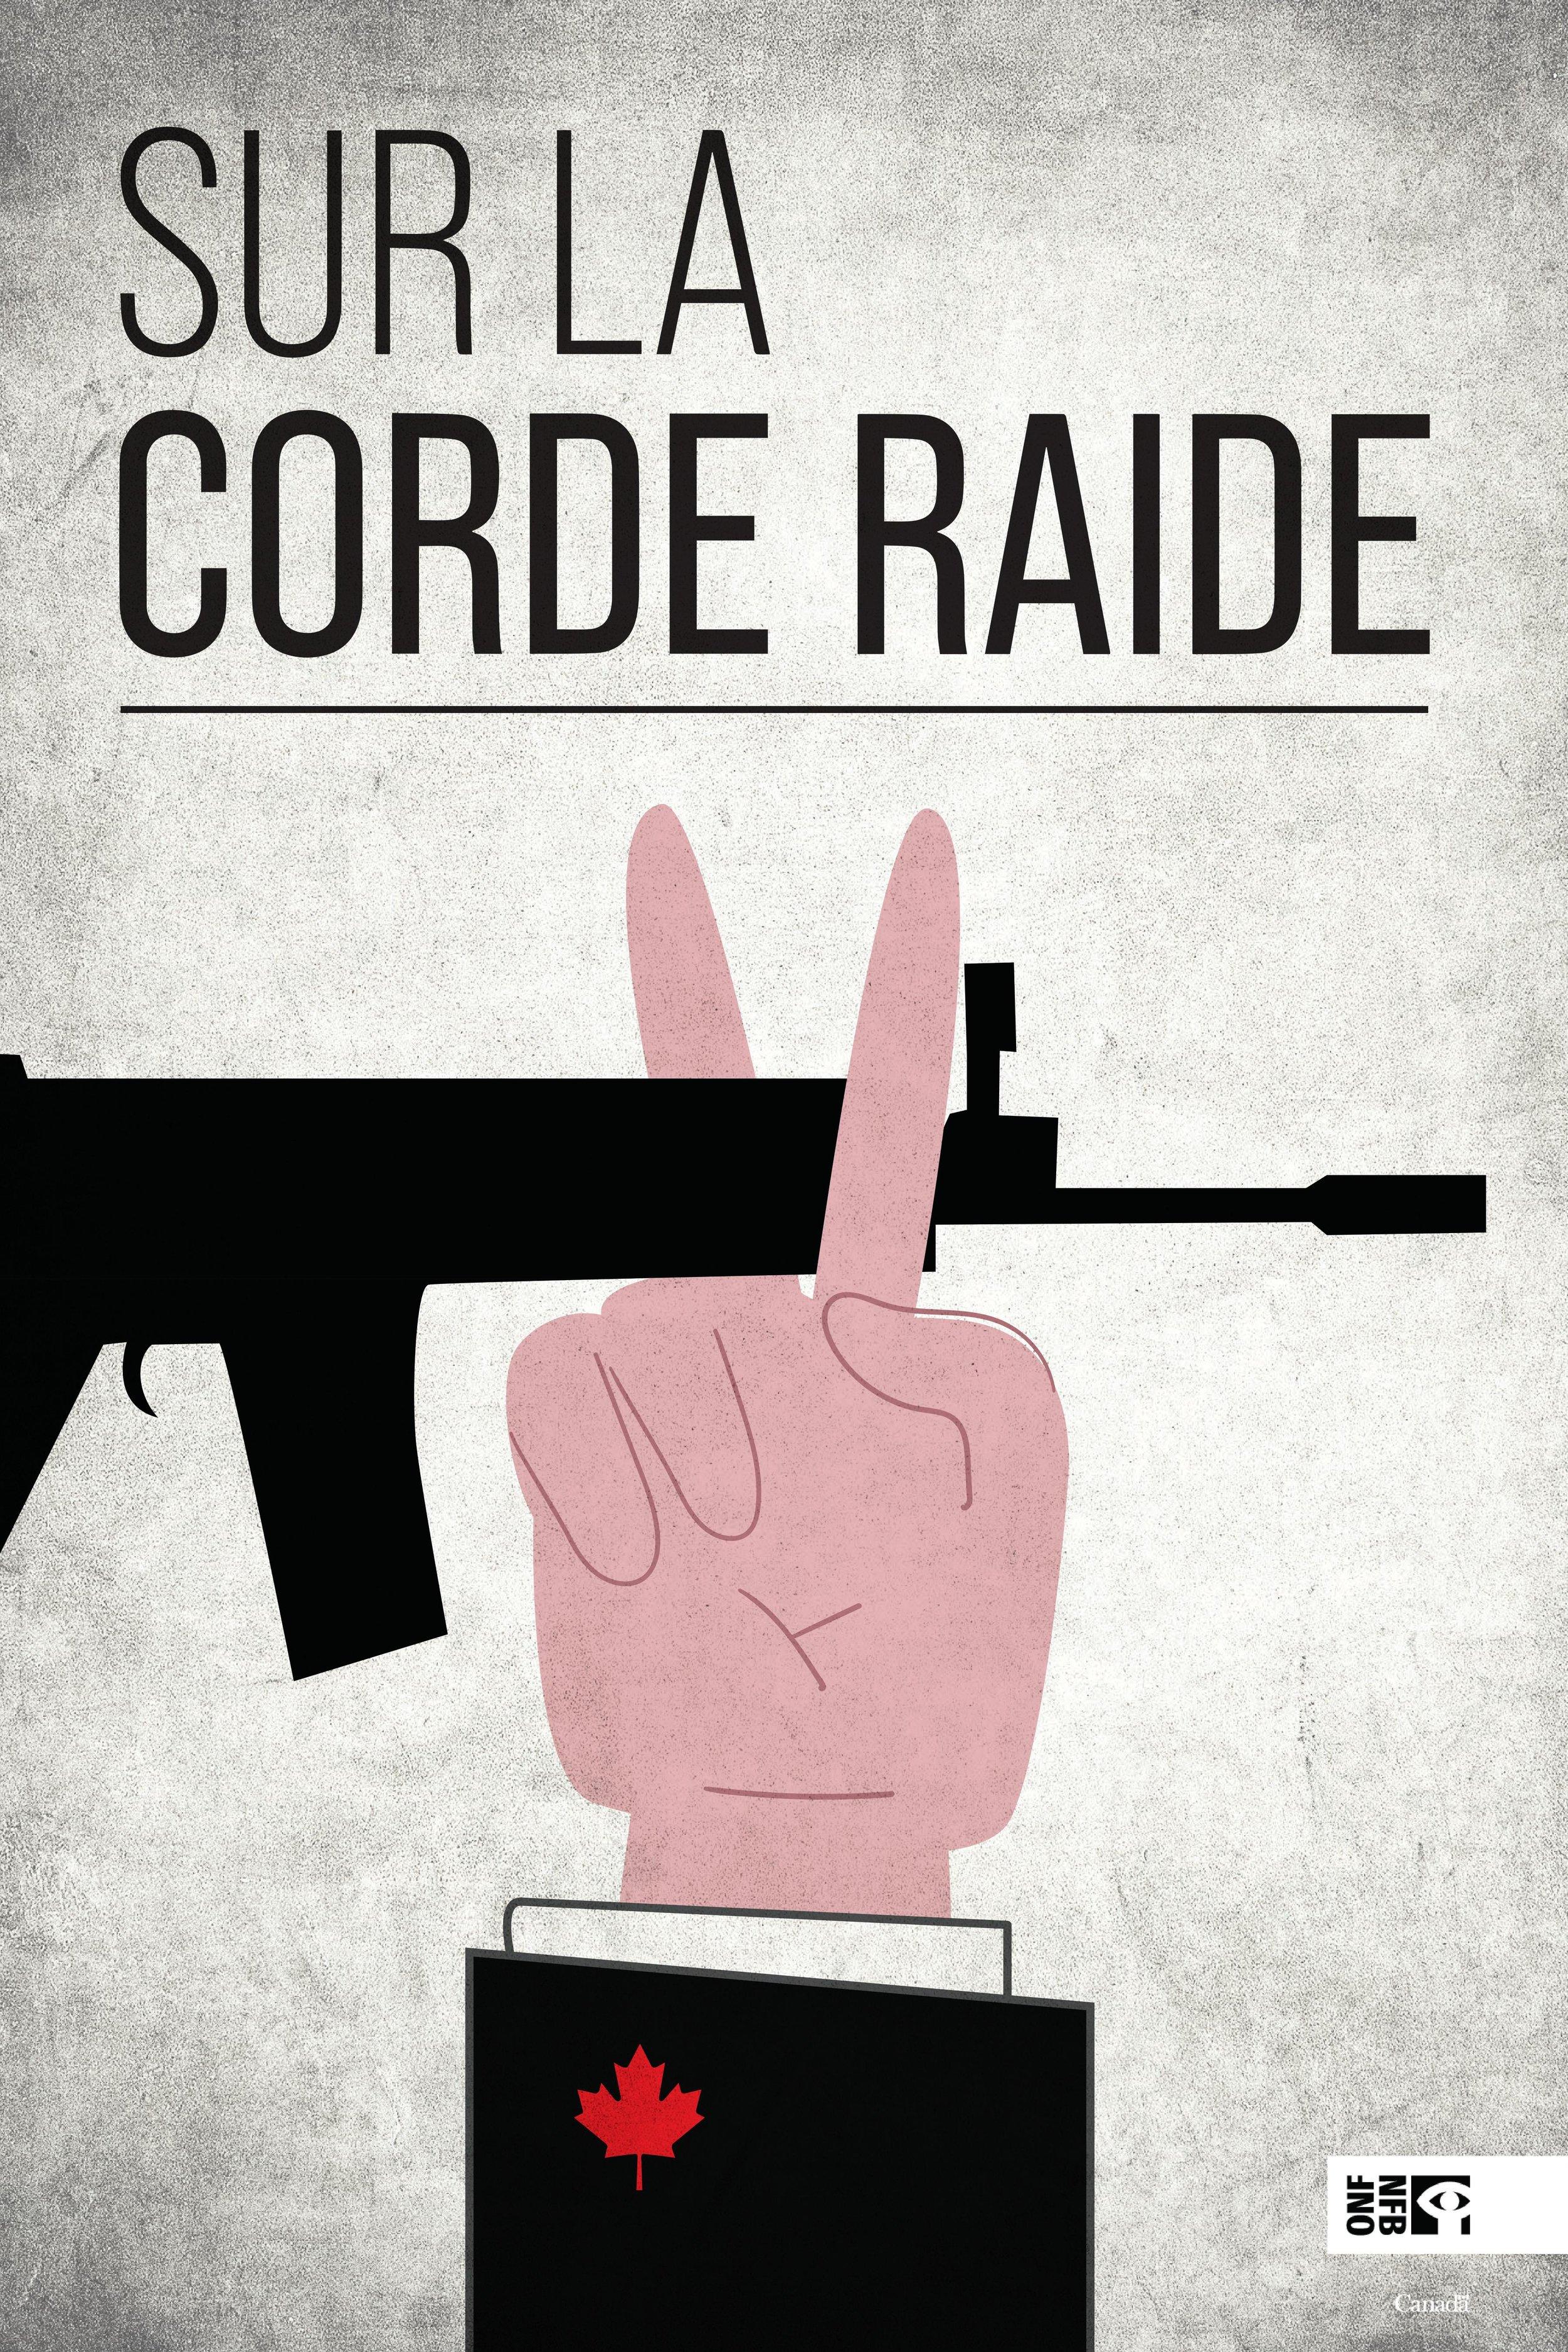 SURLACORDERAIDE-LaCamaraderie-Poster-1mars-01 (1)_00006.jpg